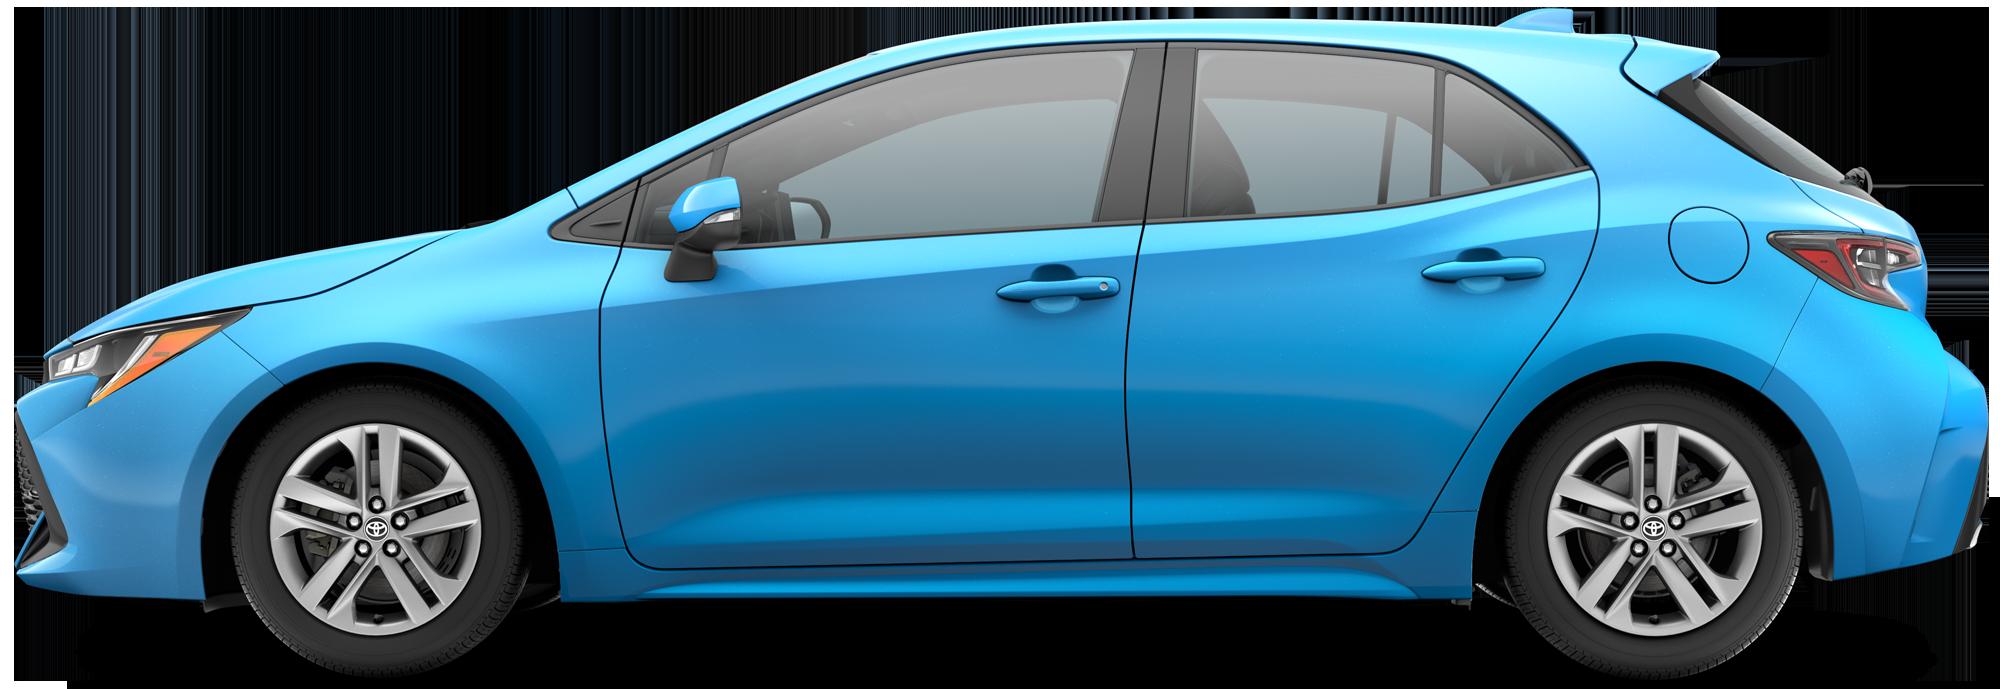 Toyota Hatchback Corolla Hatchback | Houston